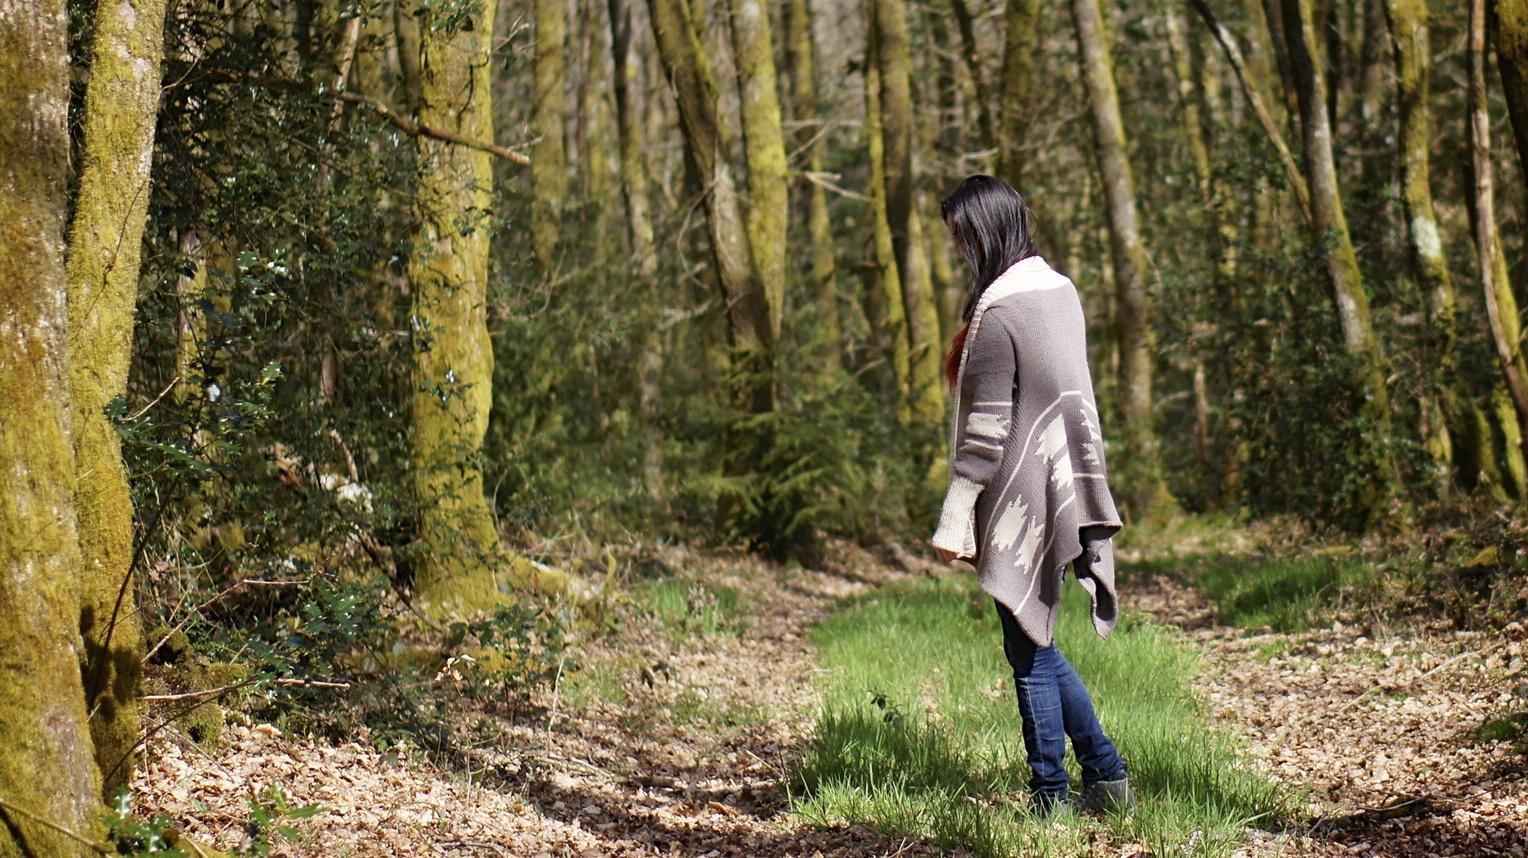 gilet Brunehilde Lili the banyan tree